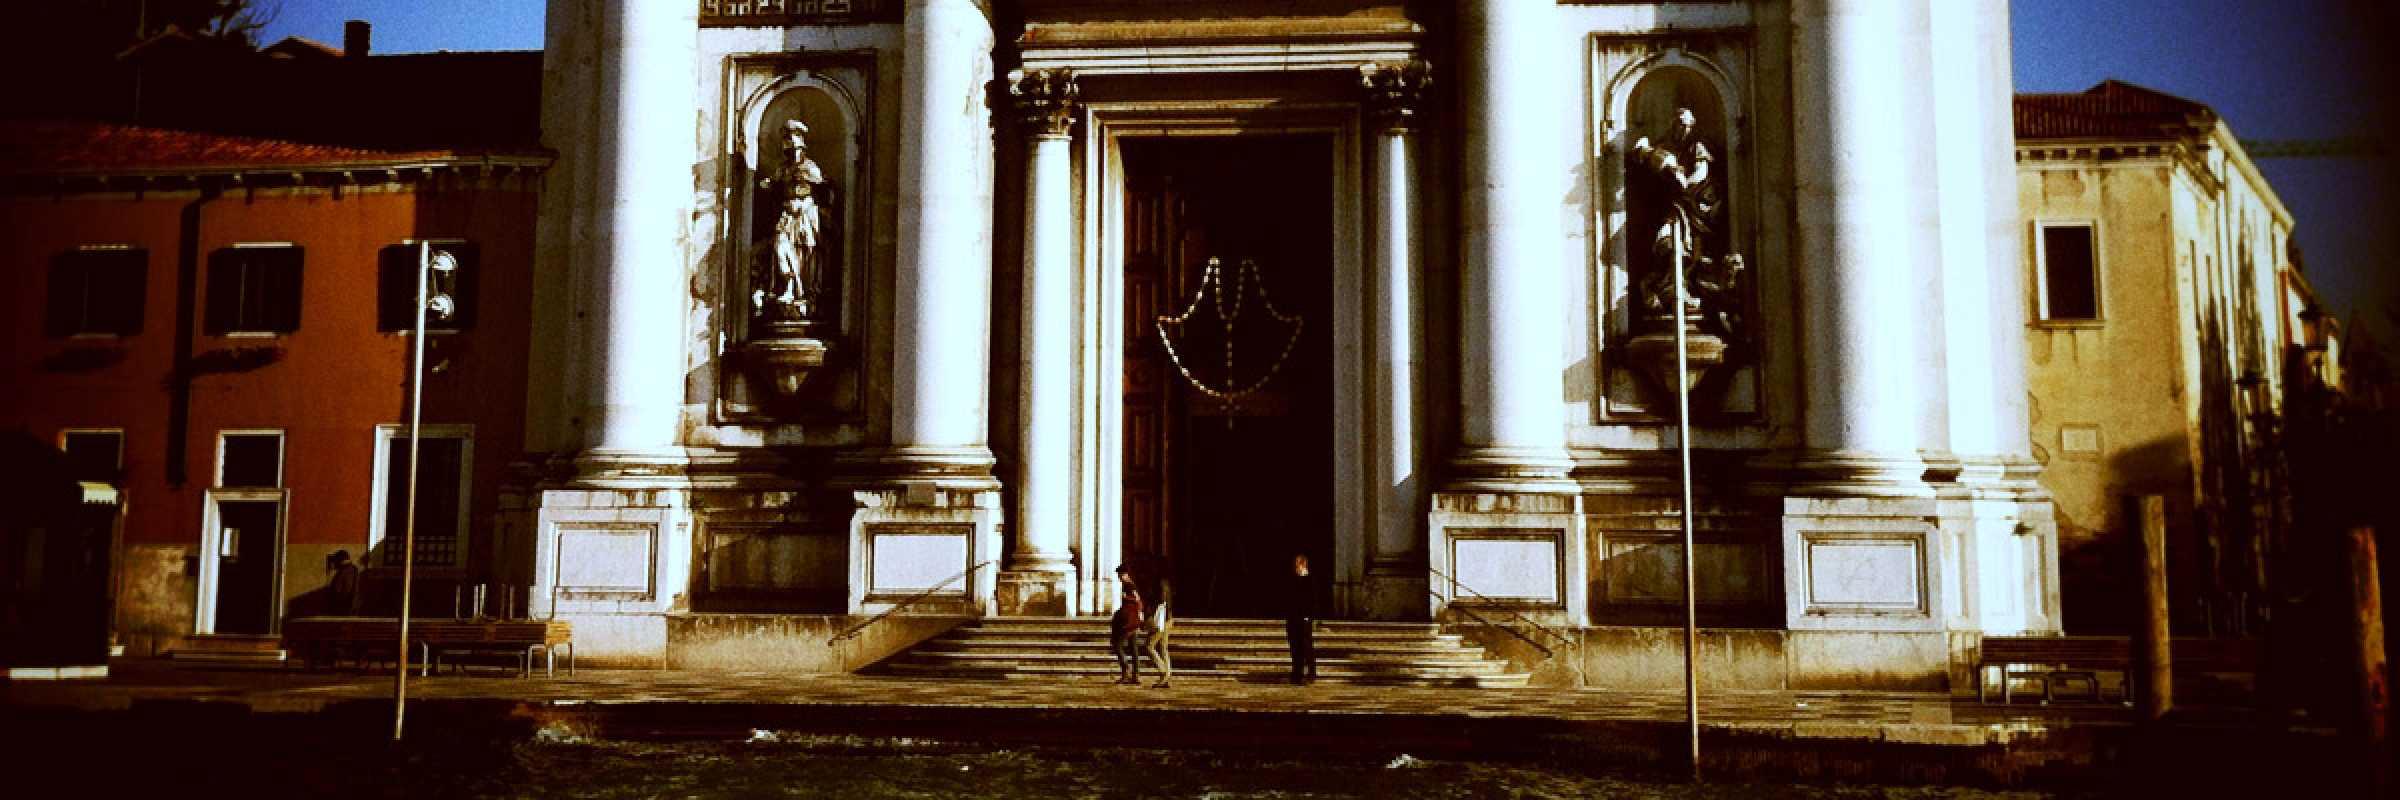 The entrance to the Gesuati church.